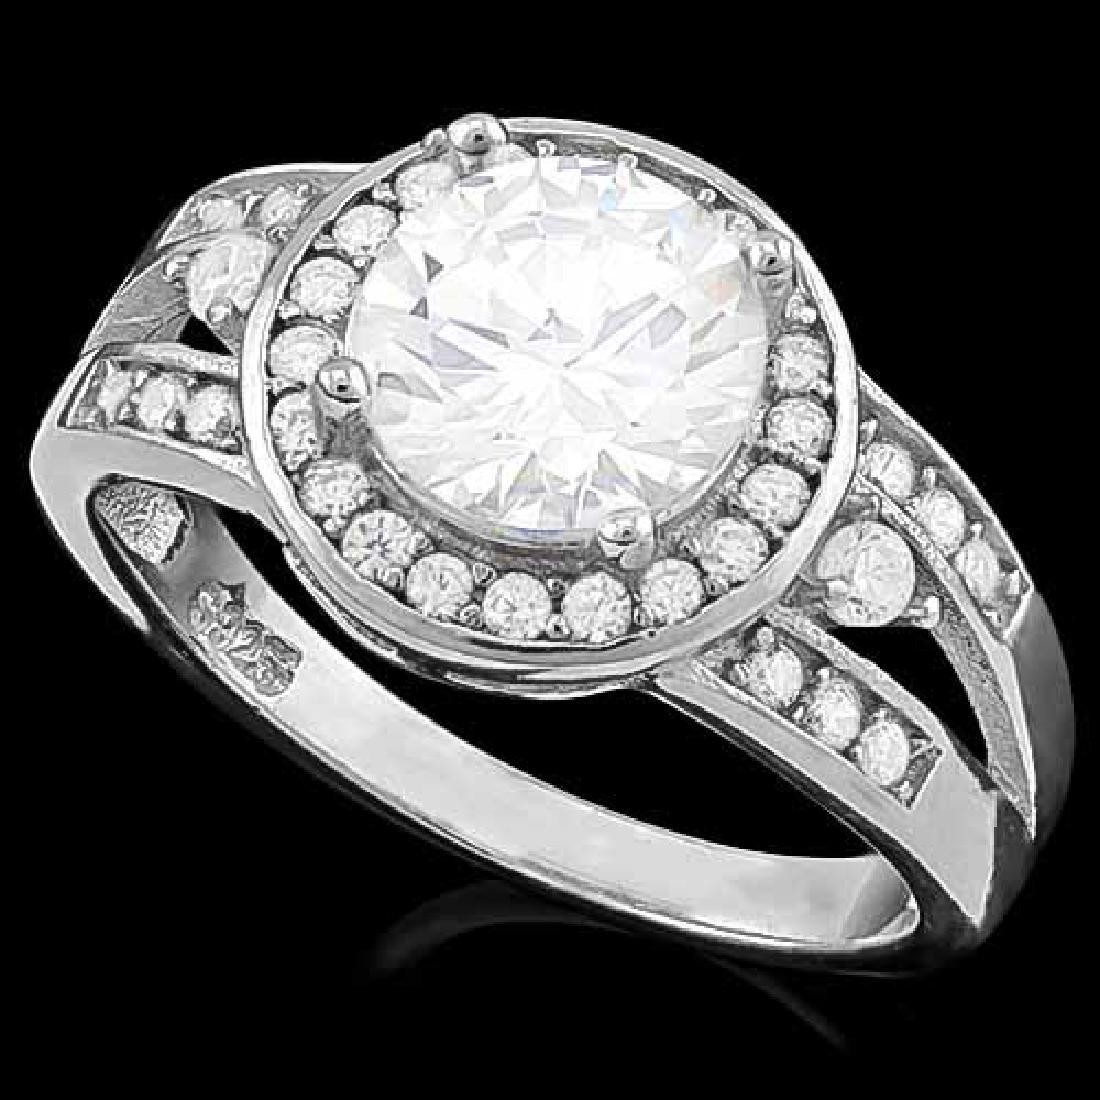 2 1/3 CARAT (35 PCS) FLAWLESS CREATED DIAMOND 925 STERL